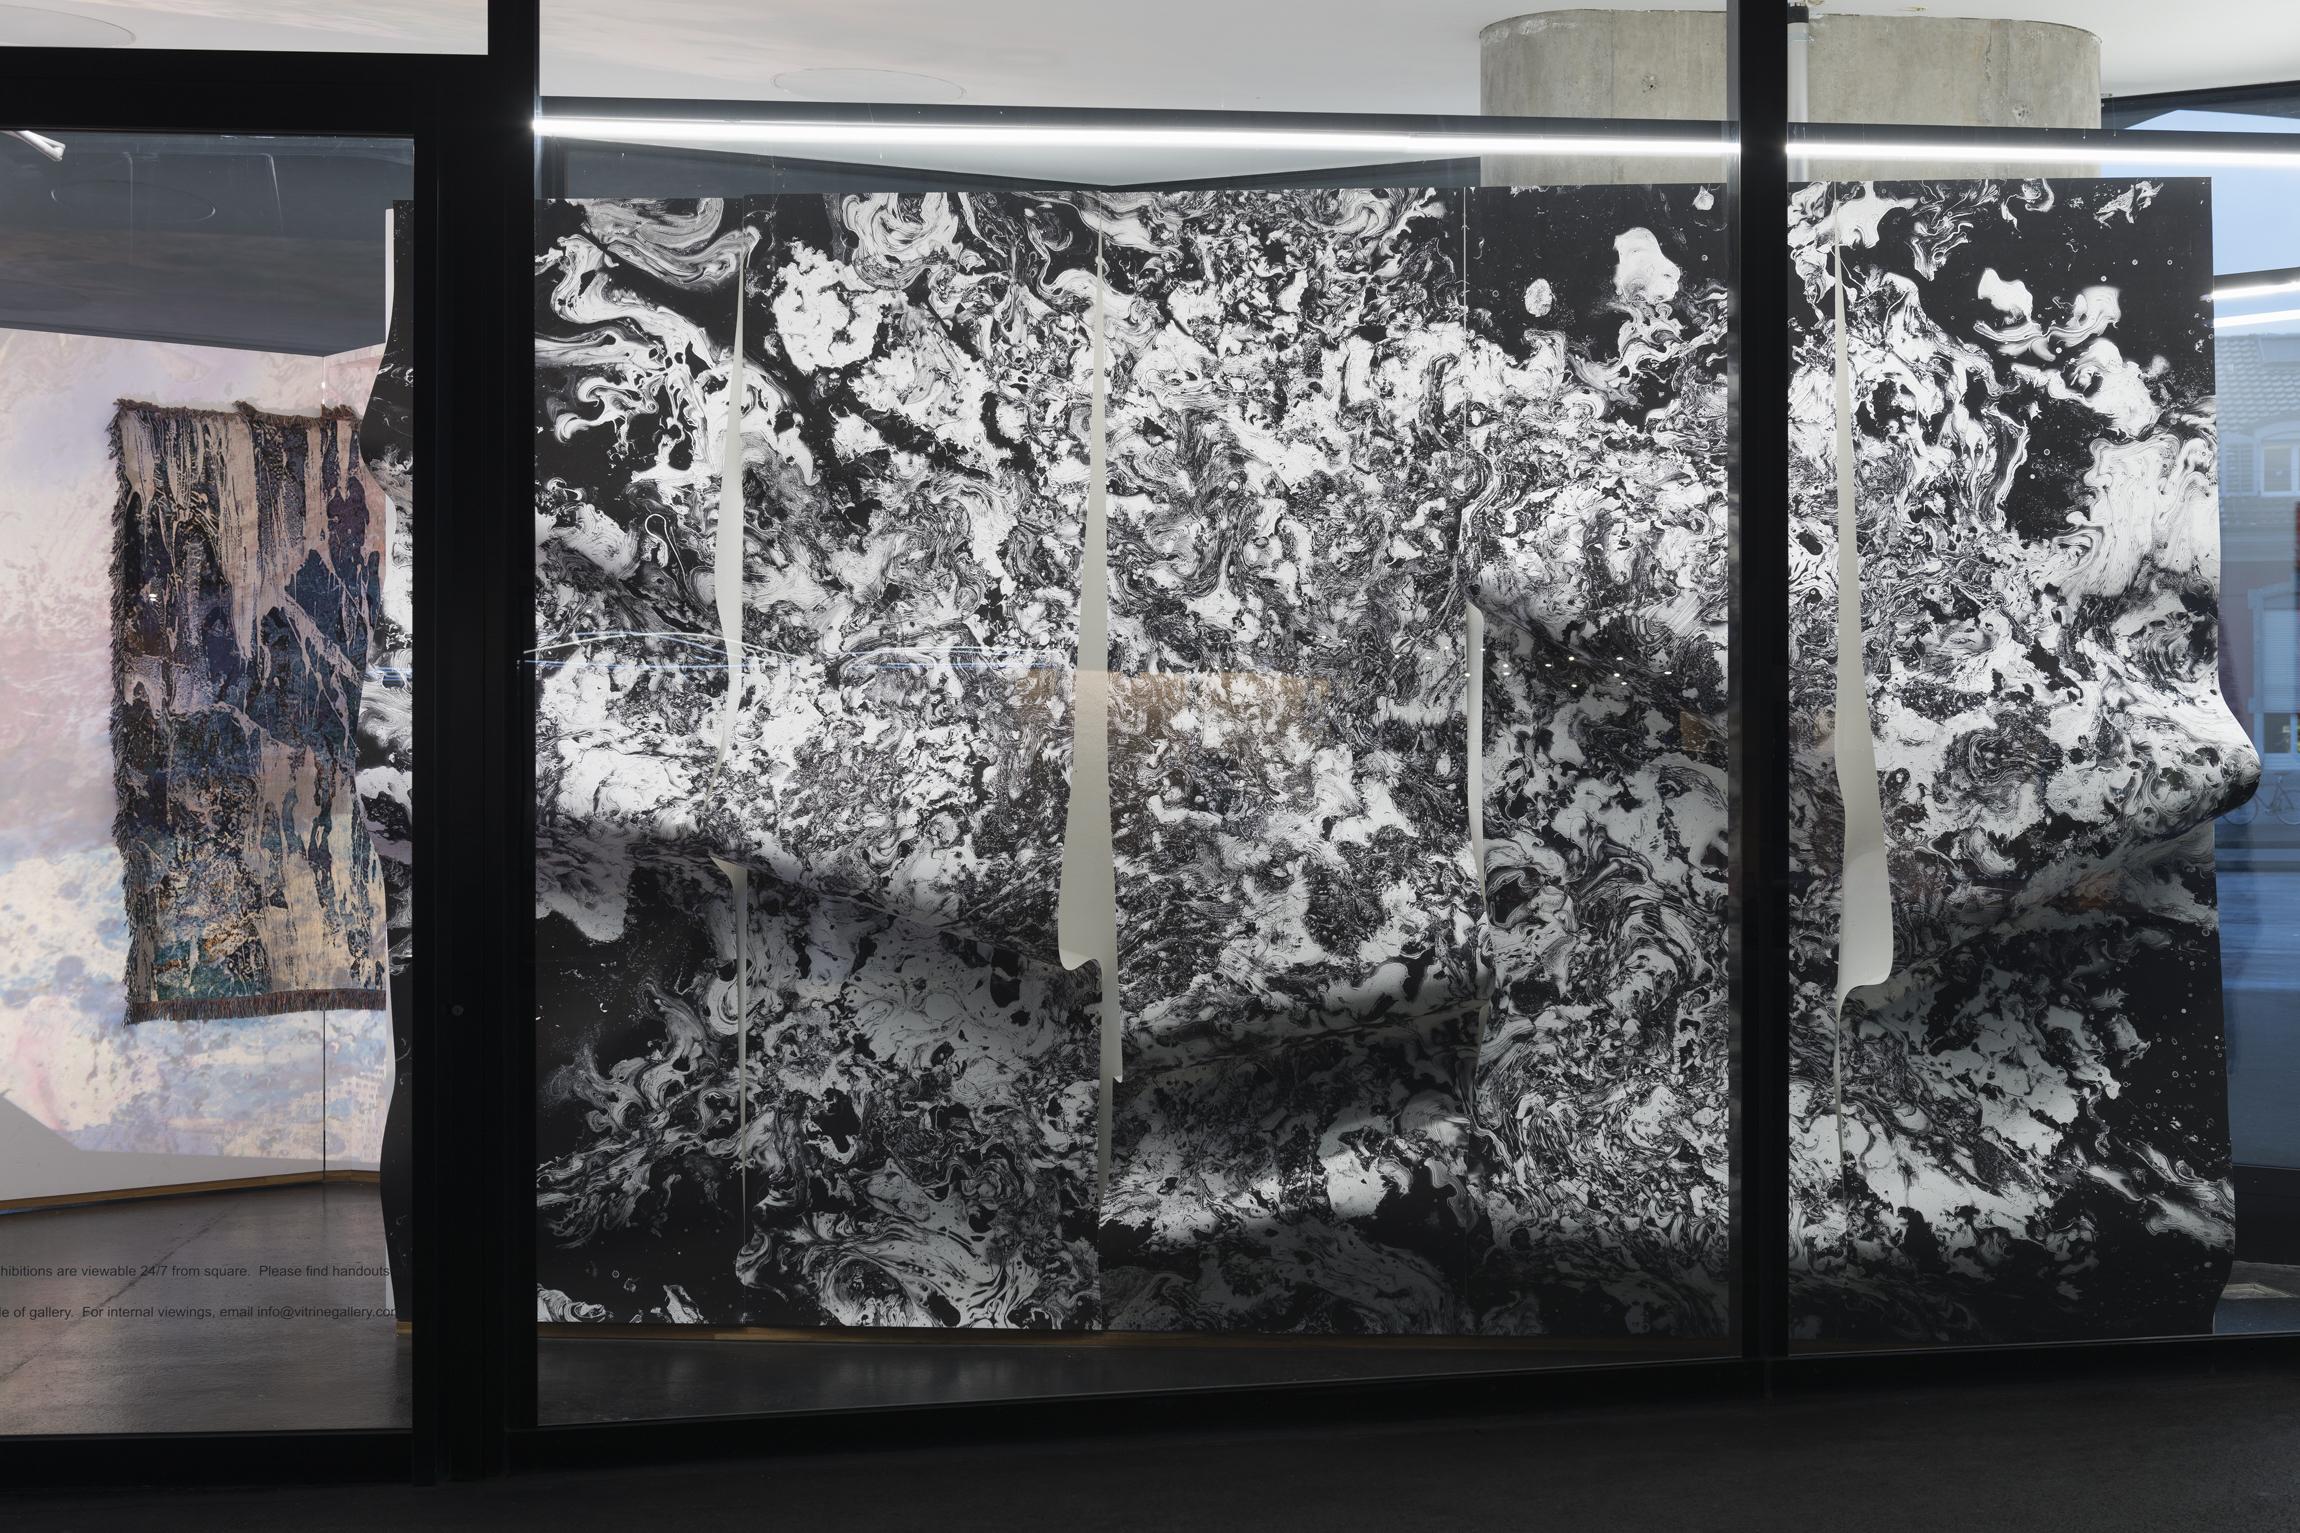 Maya Rochat, Meta Filtres (Give me Space), 2016. Inkjet on wallpaper. 300 x 230cm.